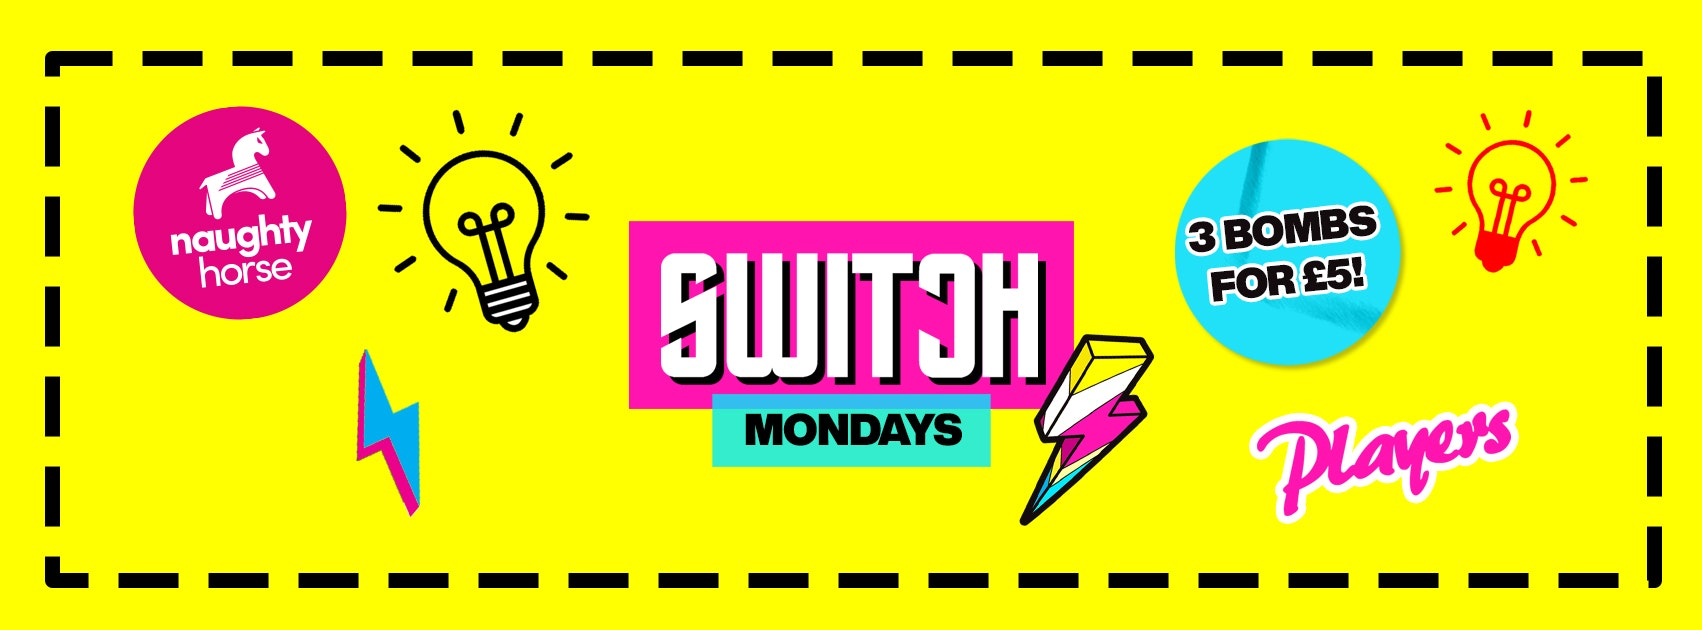 Switch – Mondays at Players!